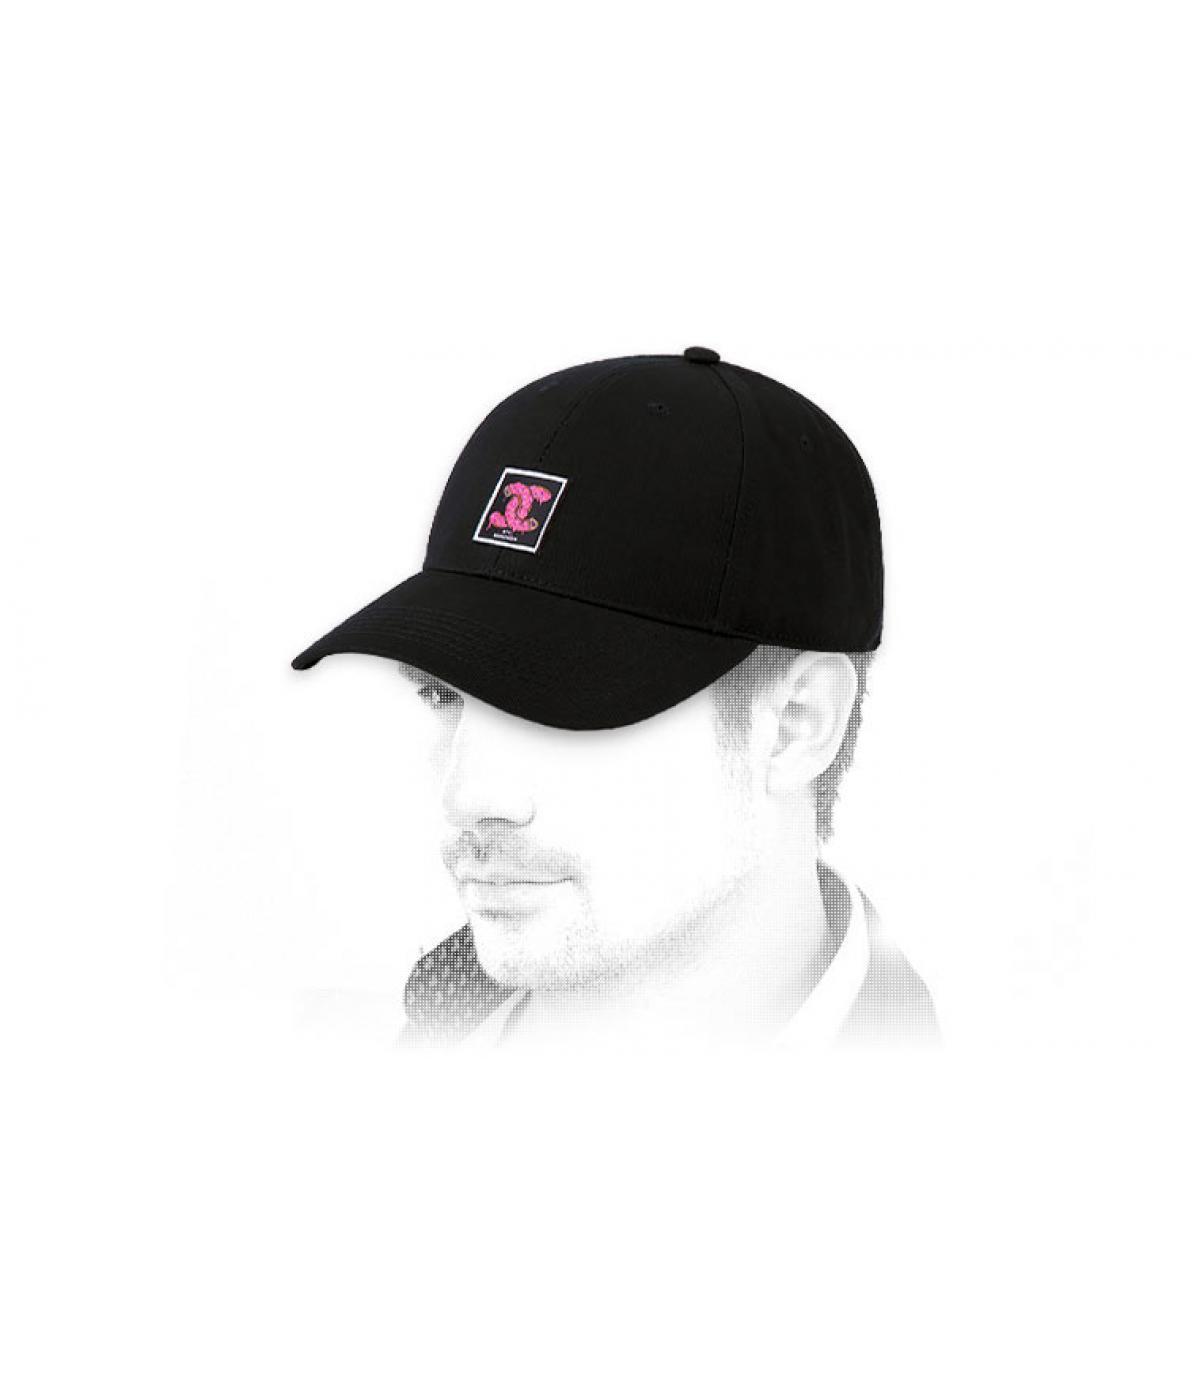 black Cayler cap logo donut